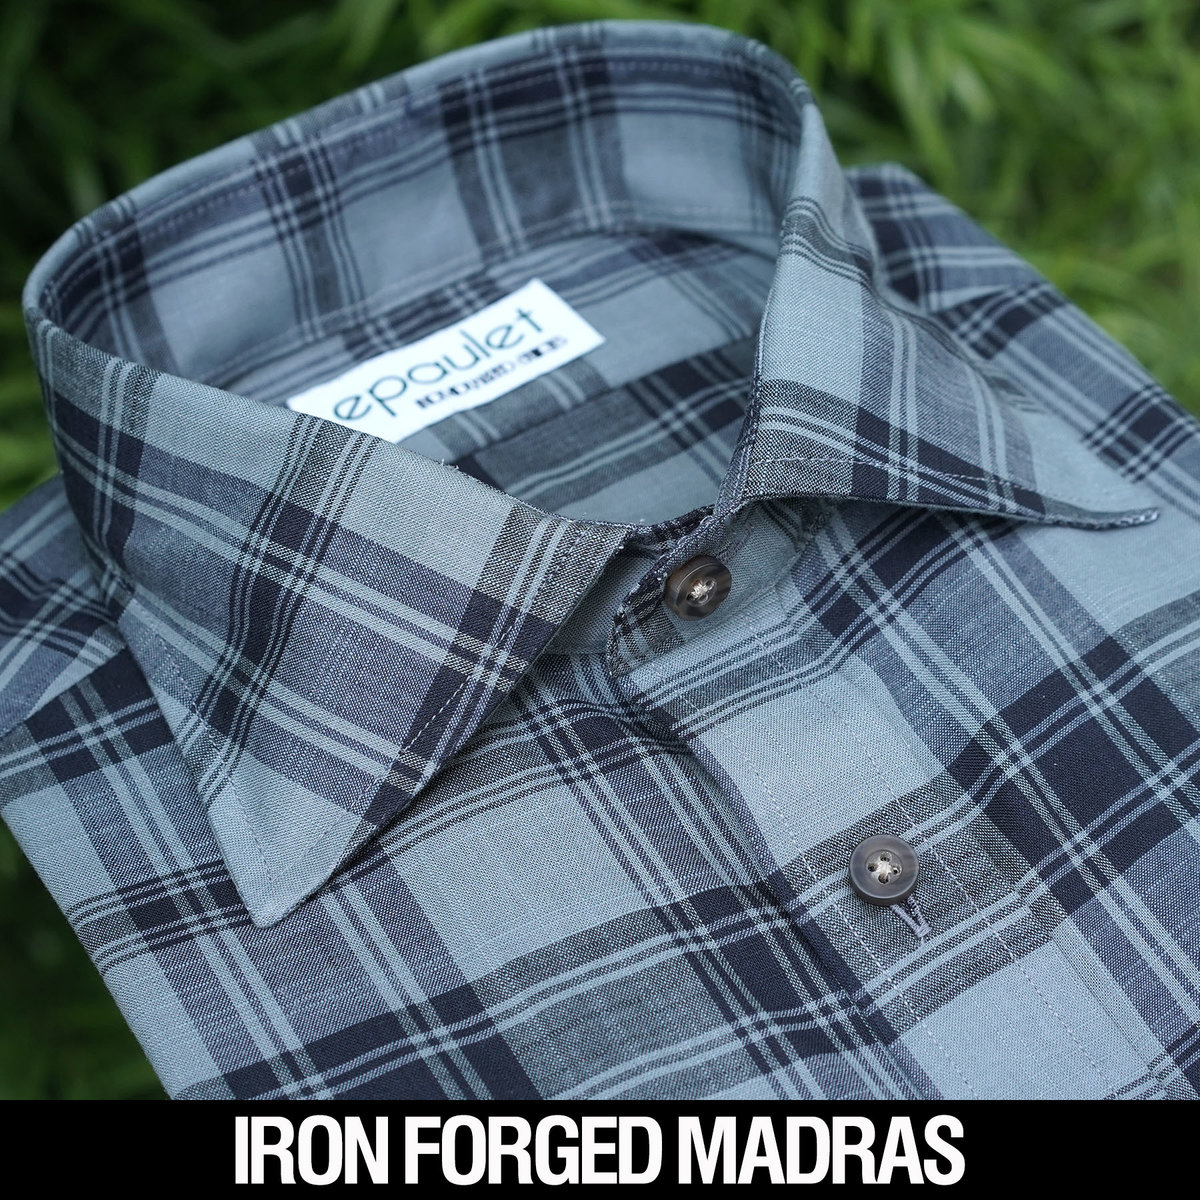 Iron Forged Madras.jpg